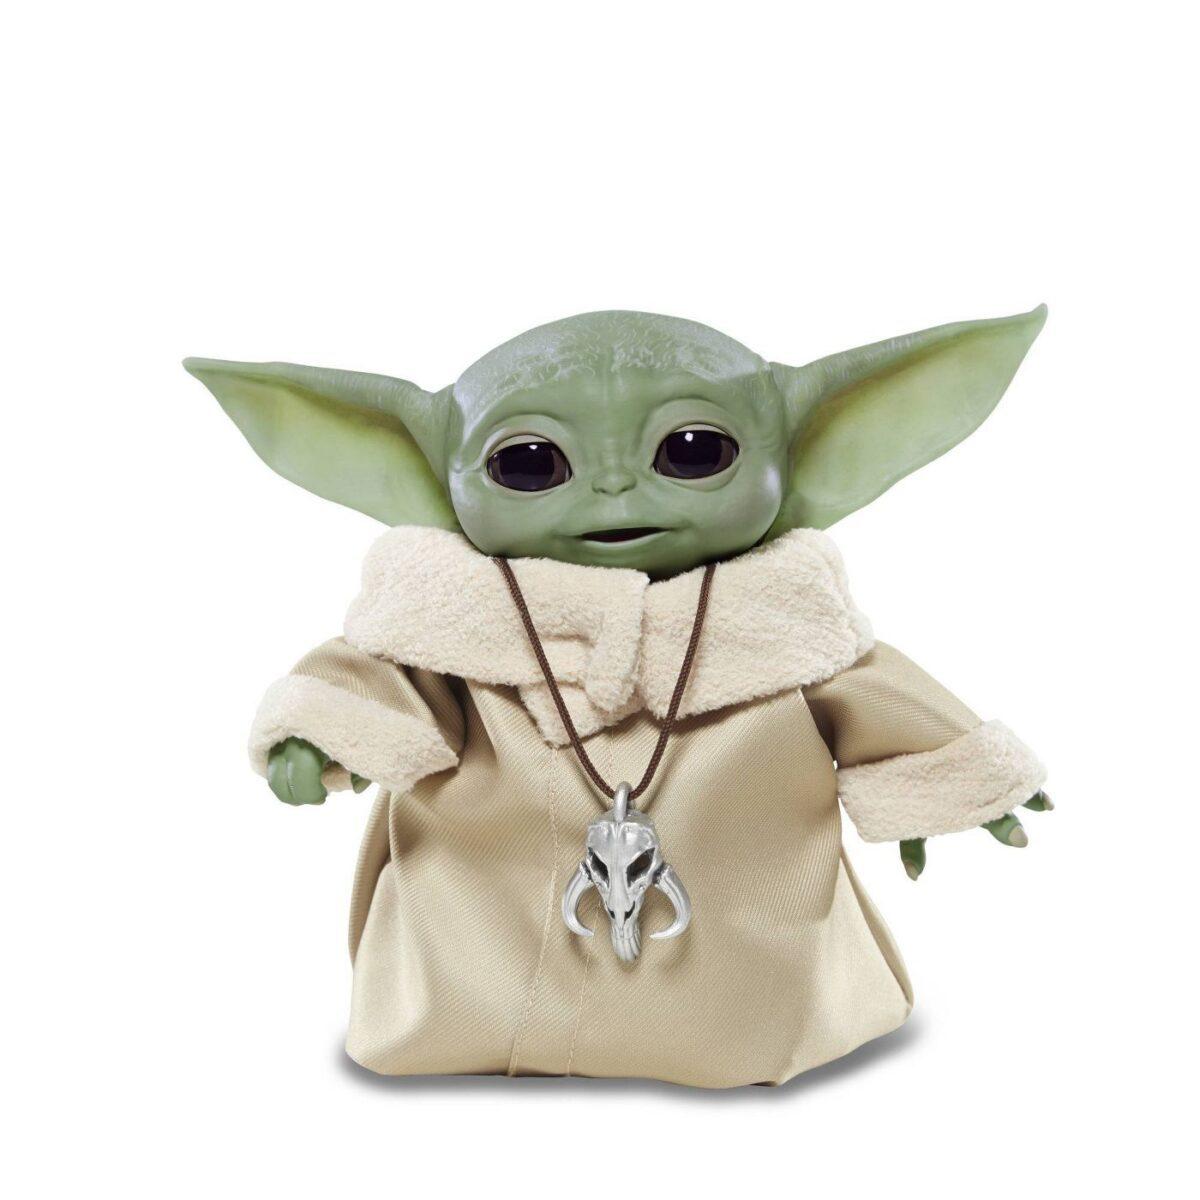 Baby Yoda Animatronic Edition